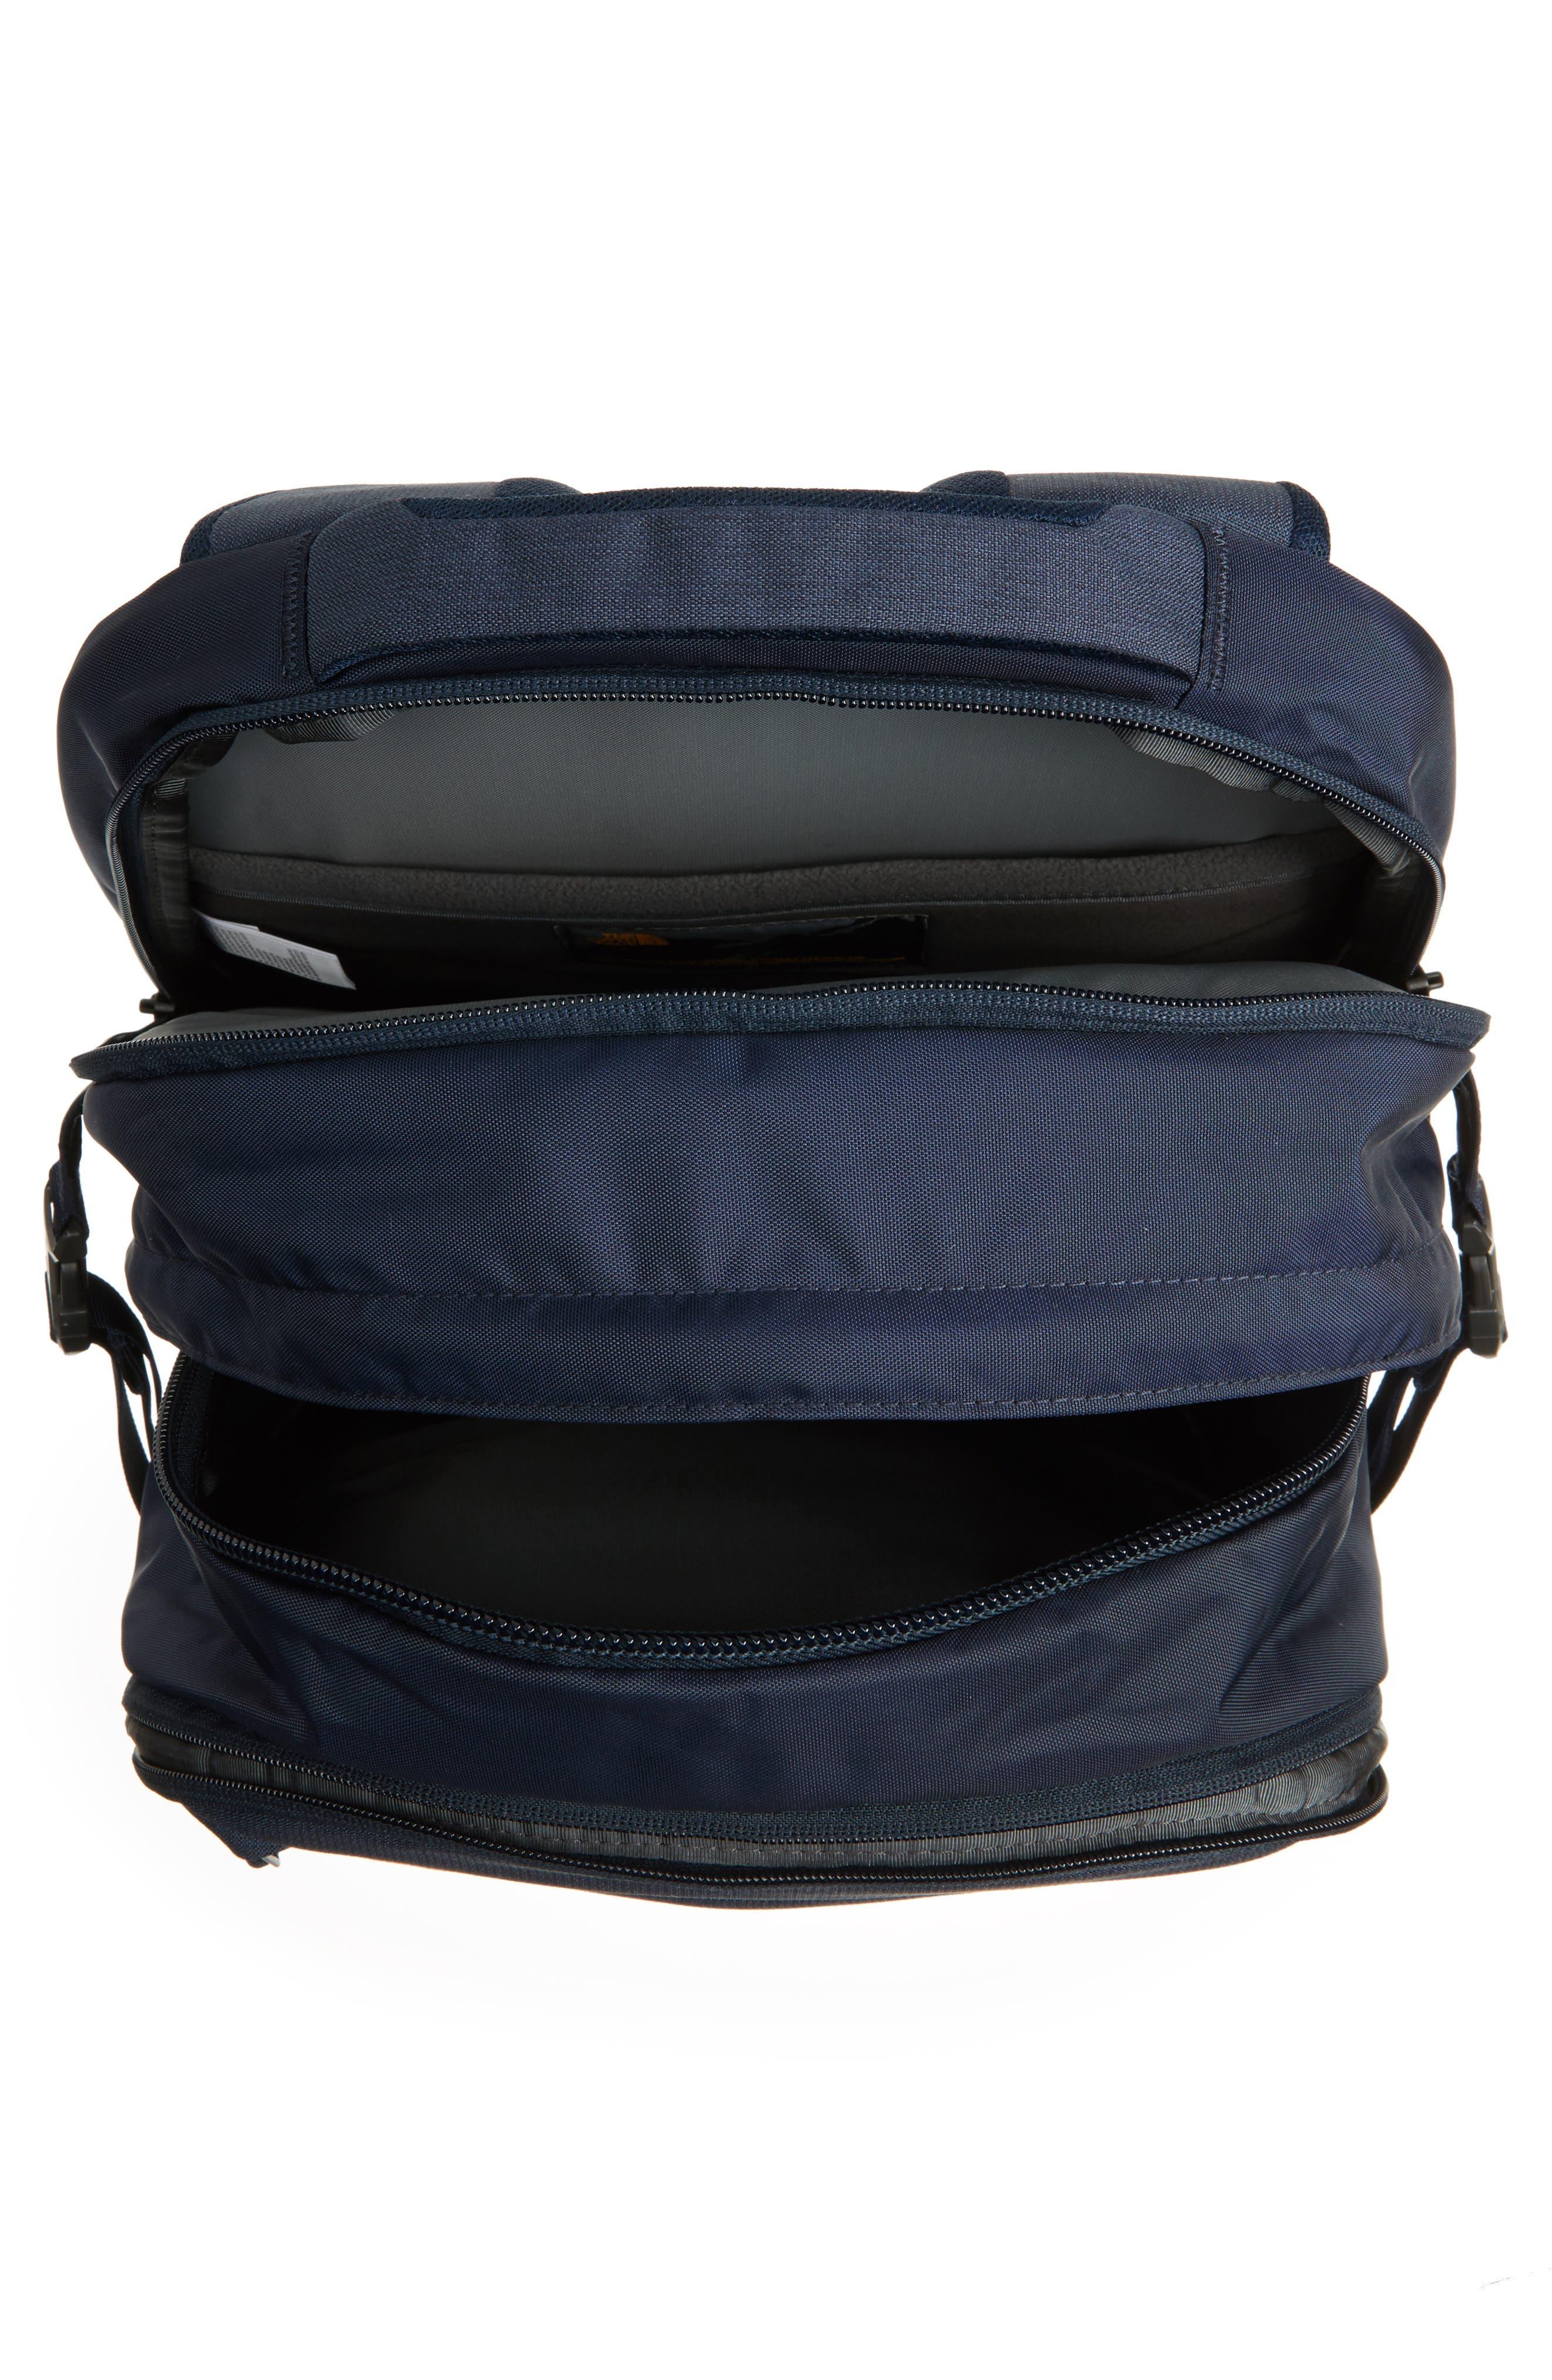 Surge 33L Backpack,                             Alternate thumbnail 15, color,